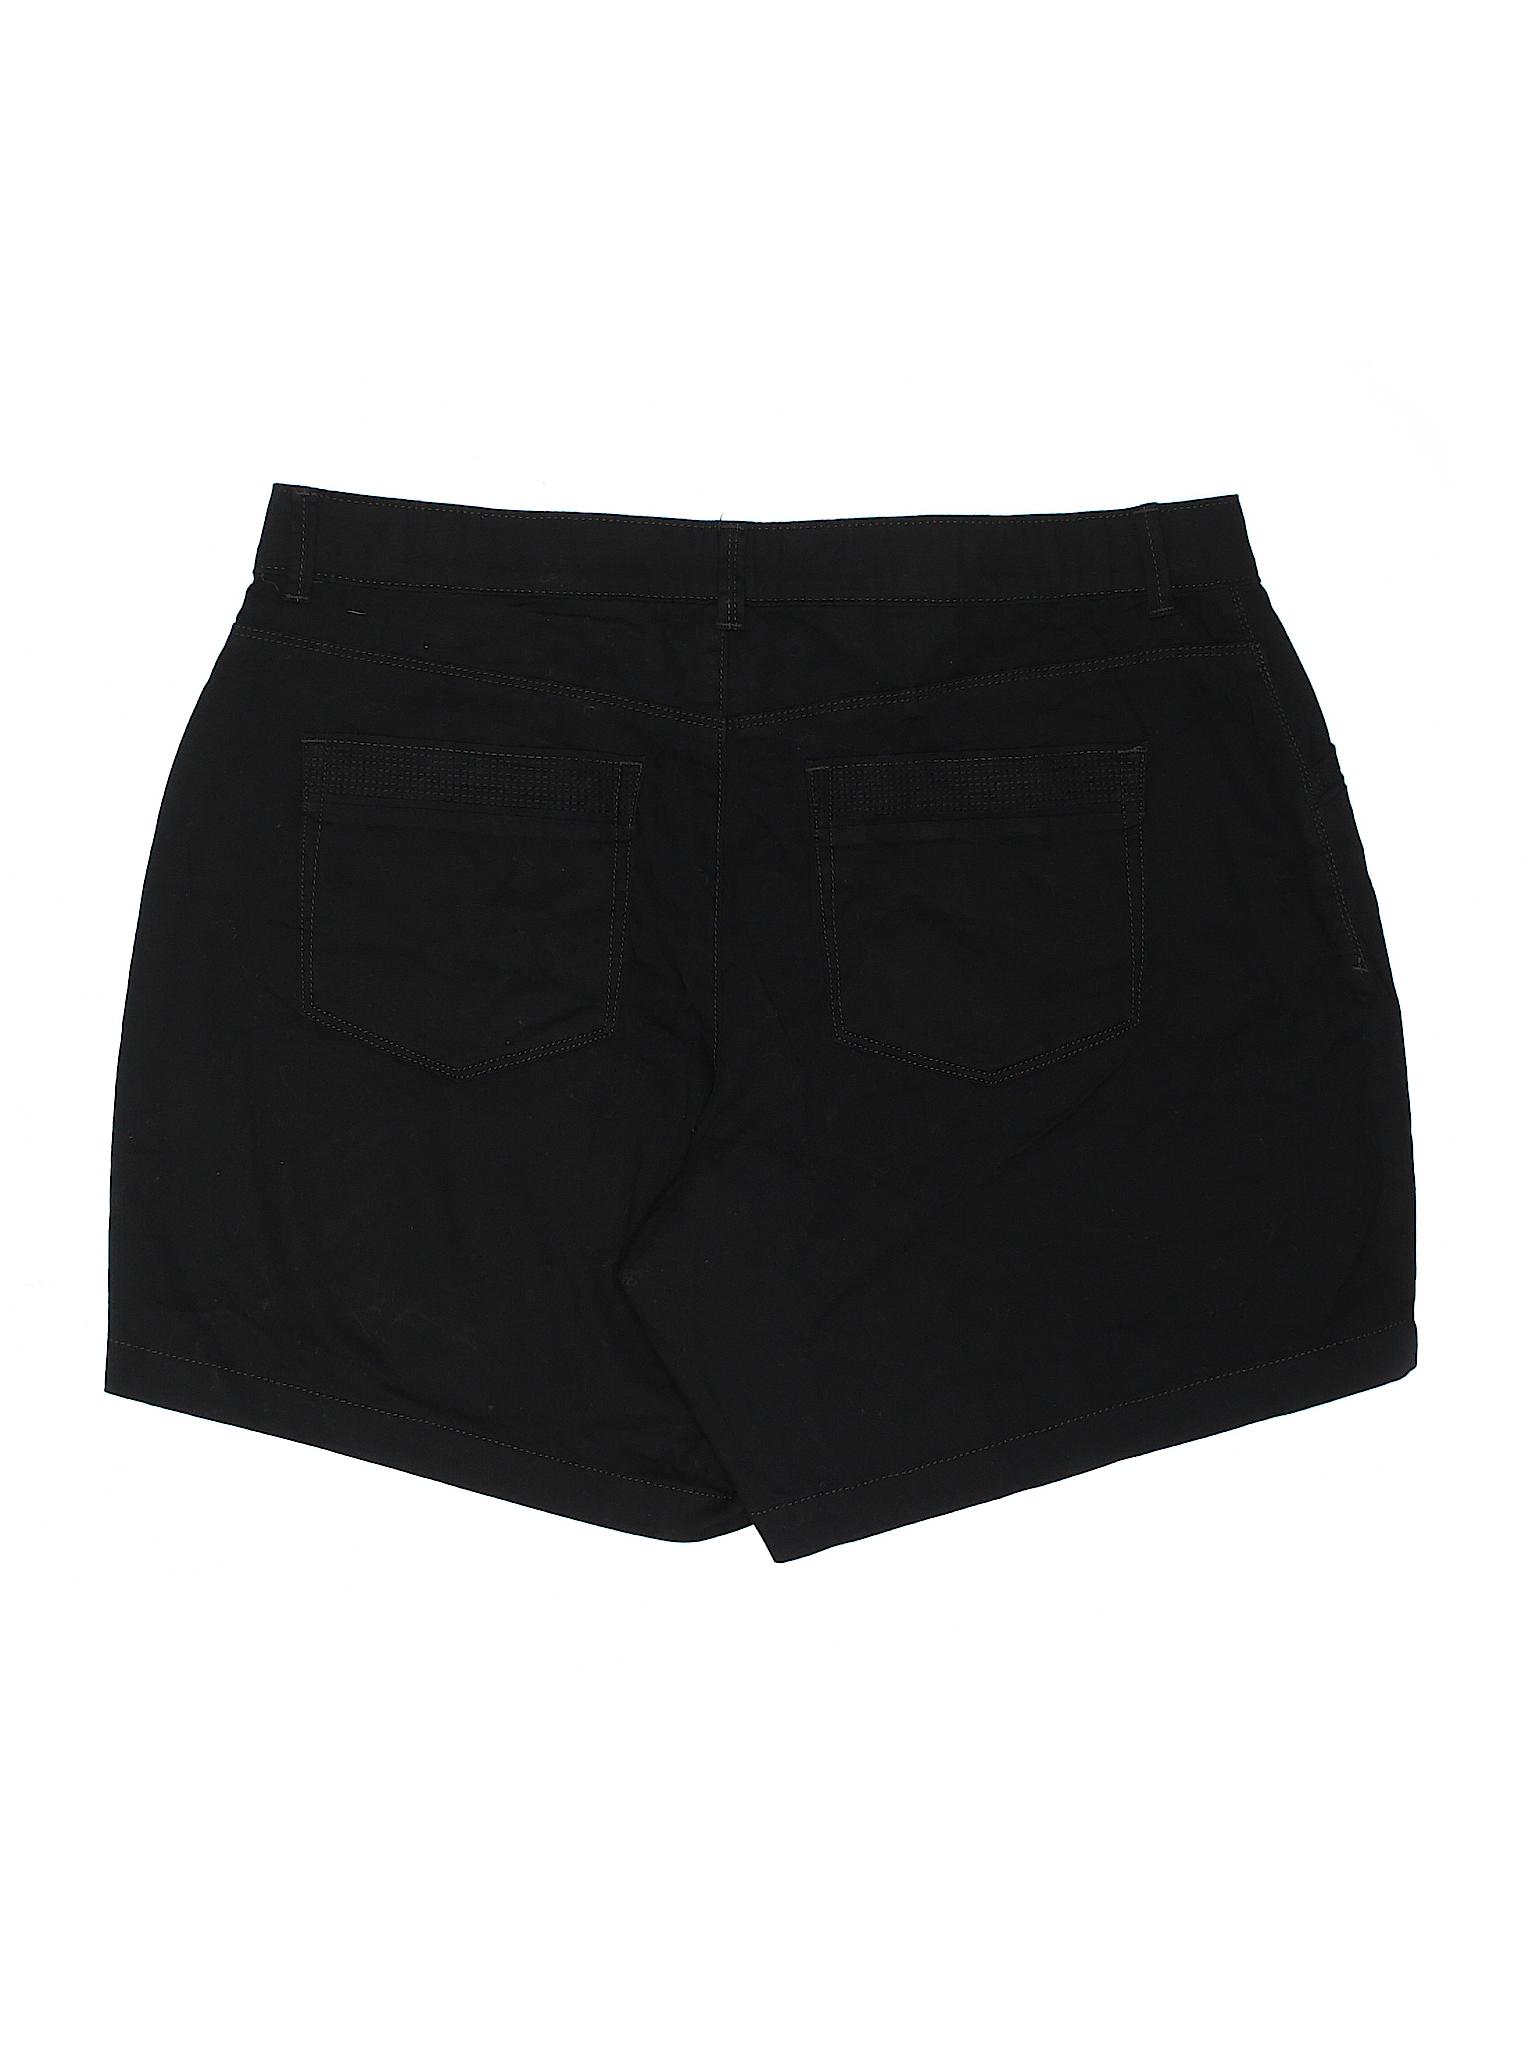 Lee Shorts Shorts Boutique Boutique Boutique Khaki Lee Khaki Lee qOaWE1O